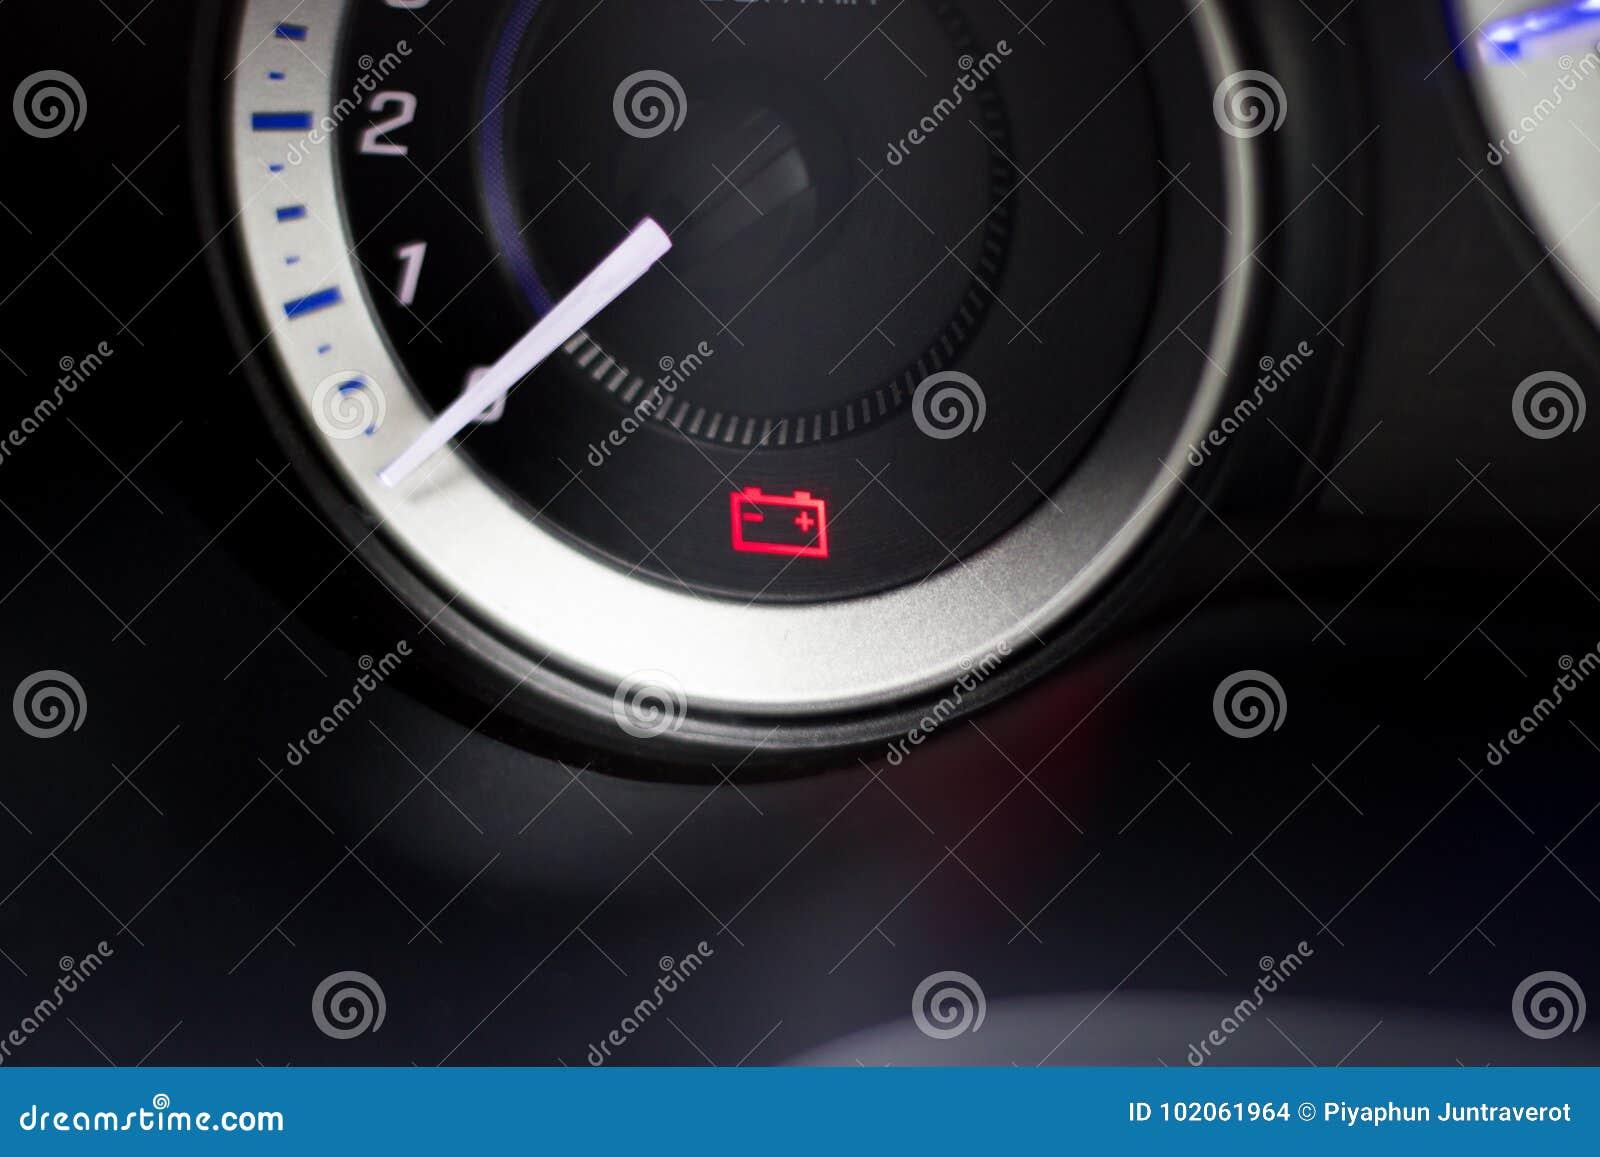 Screen Symbols Battery Warning Light In Car Stock Photo Image Of